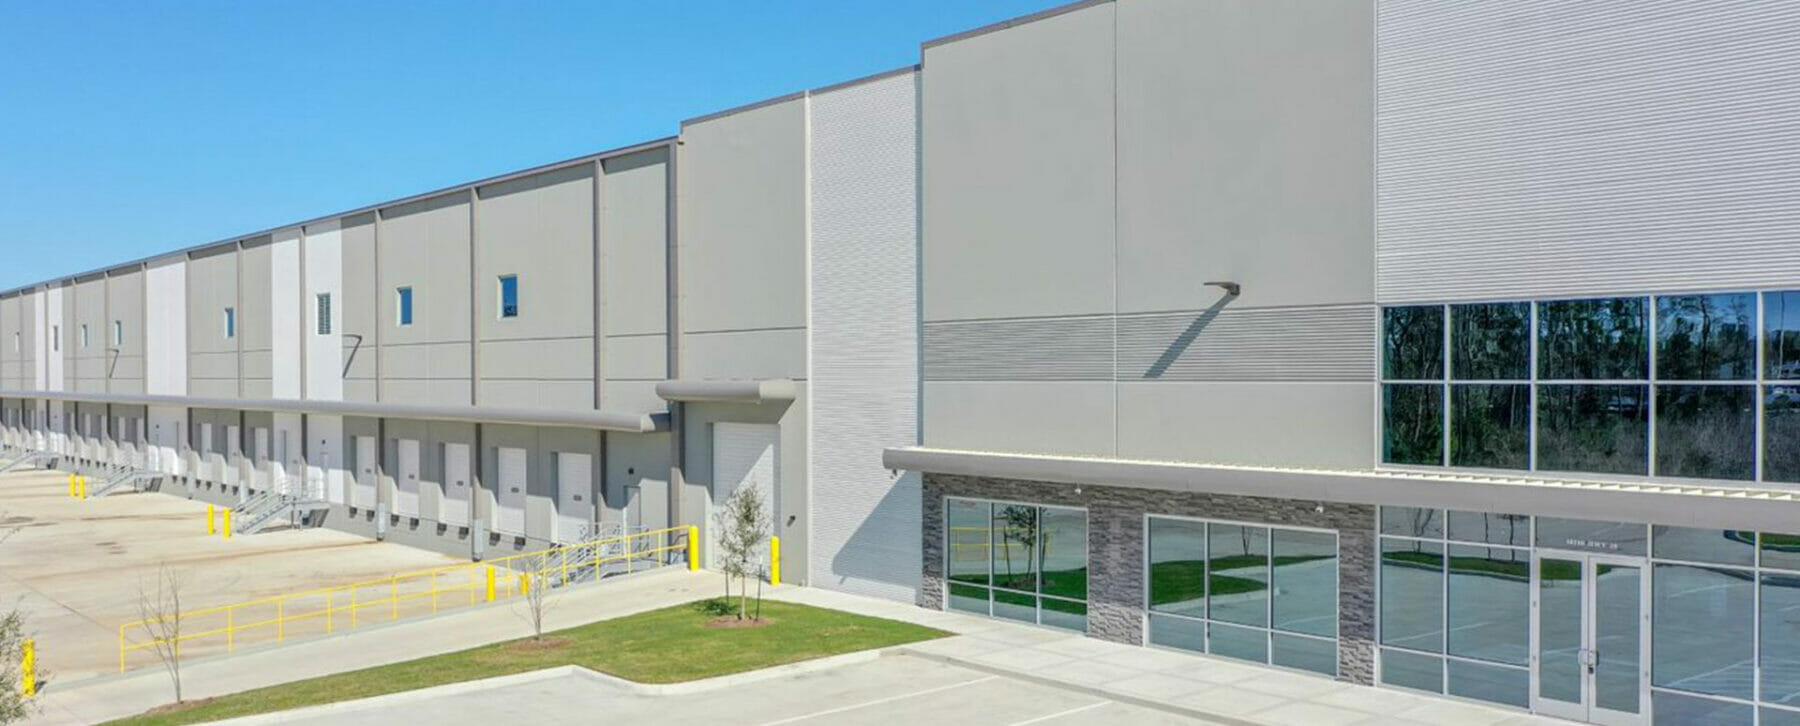 Air 59 Logistics Center - Humble, TX 2